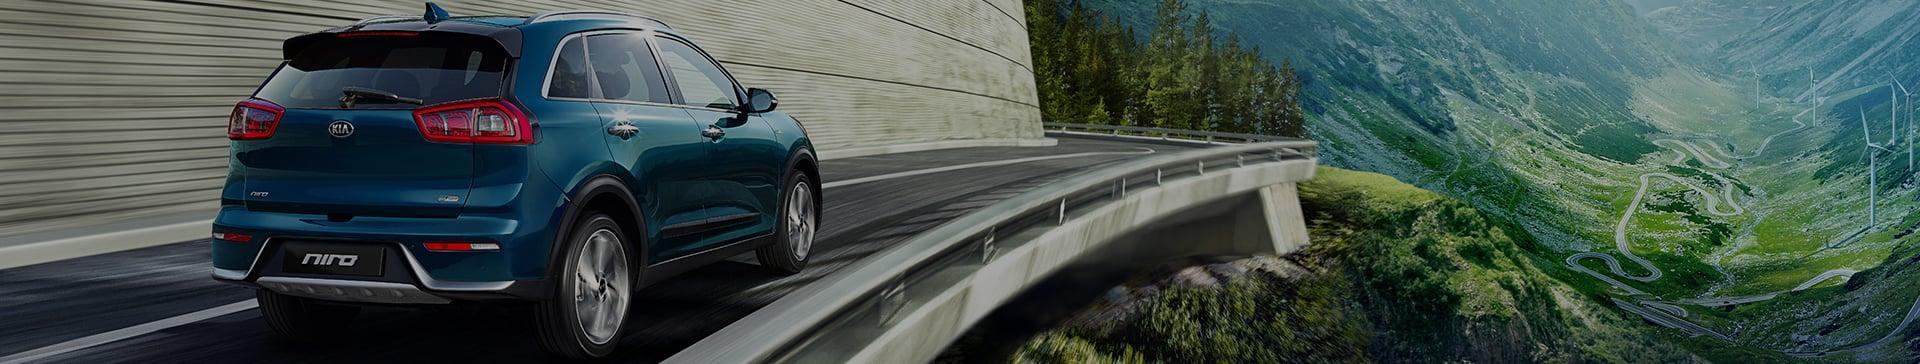 Kia Car Sales